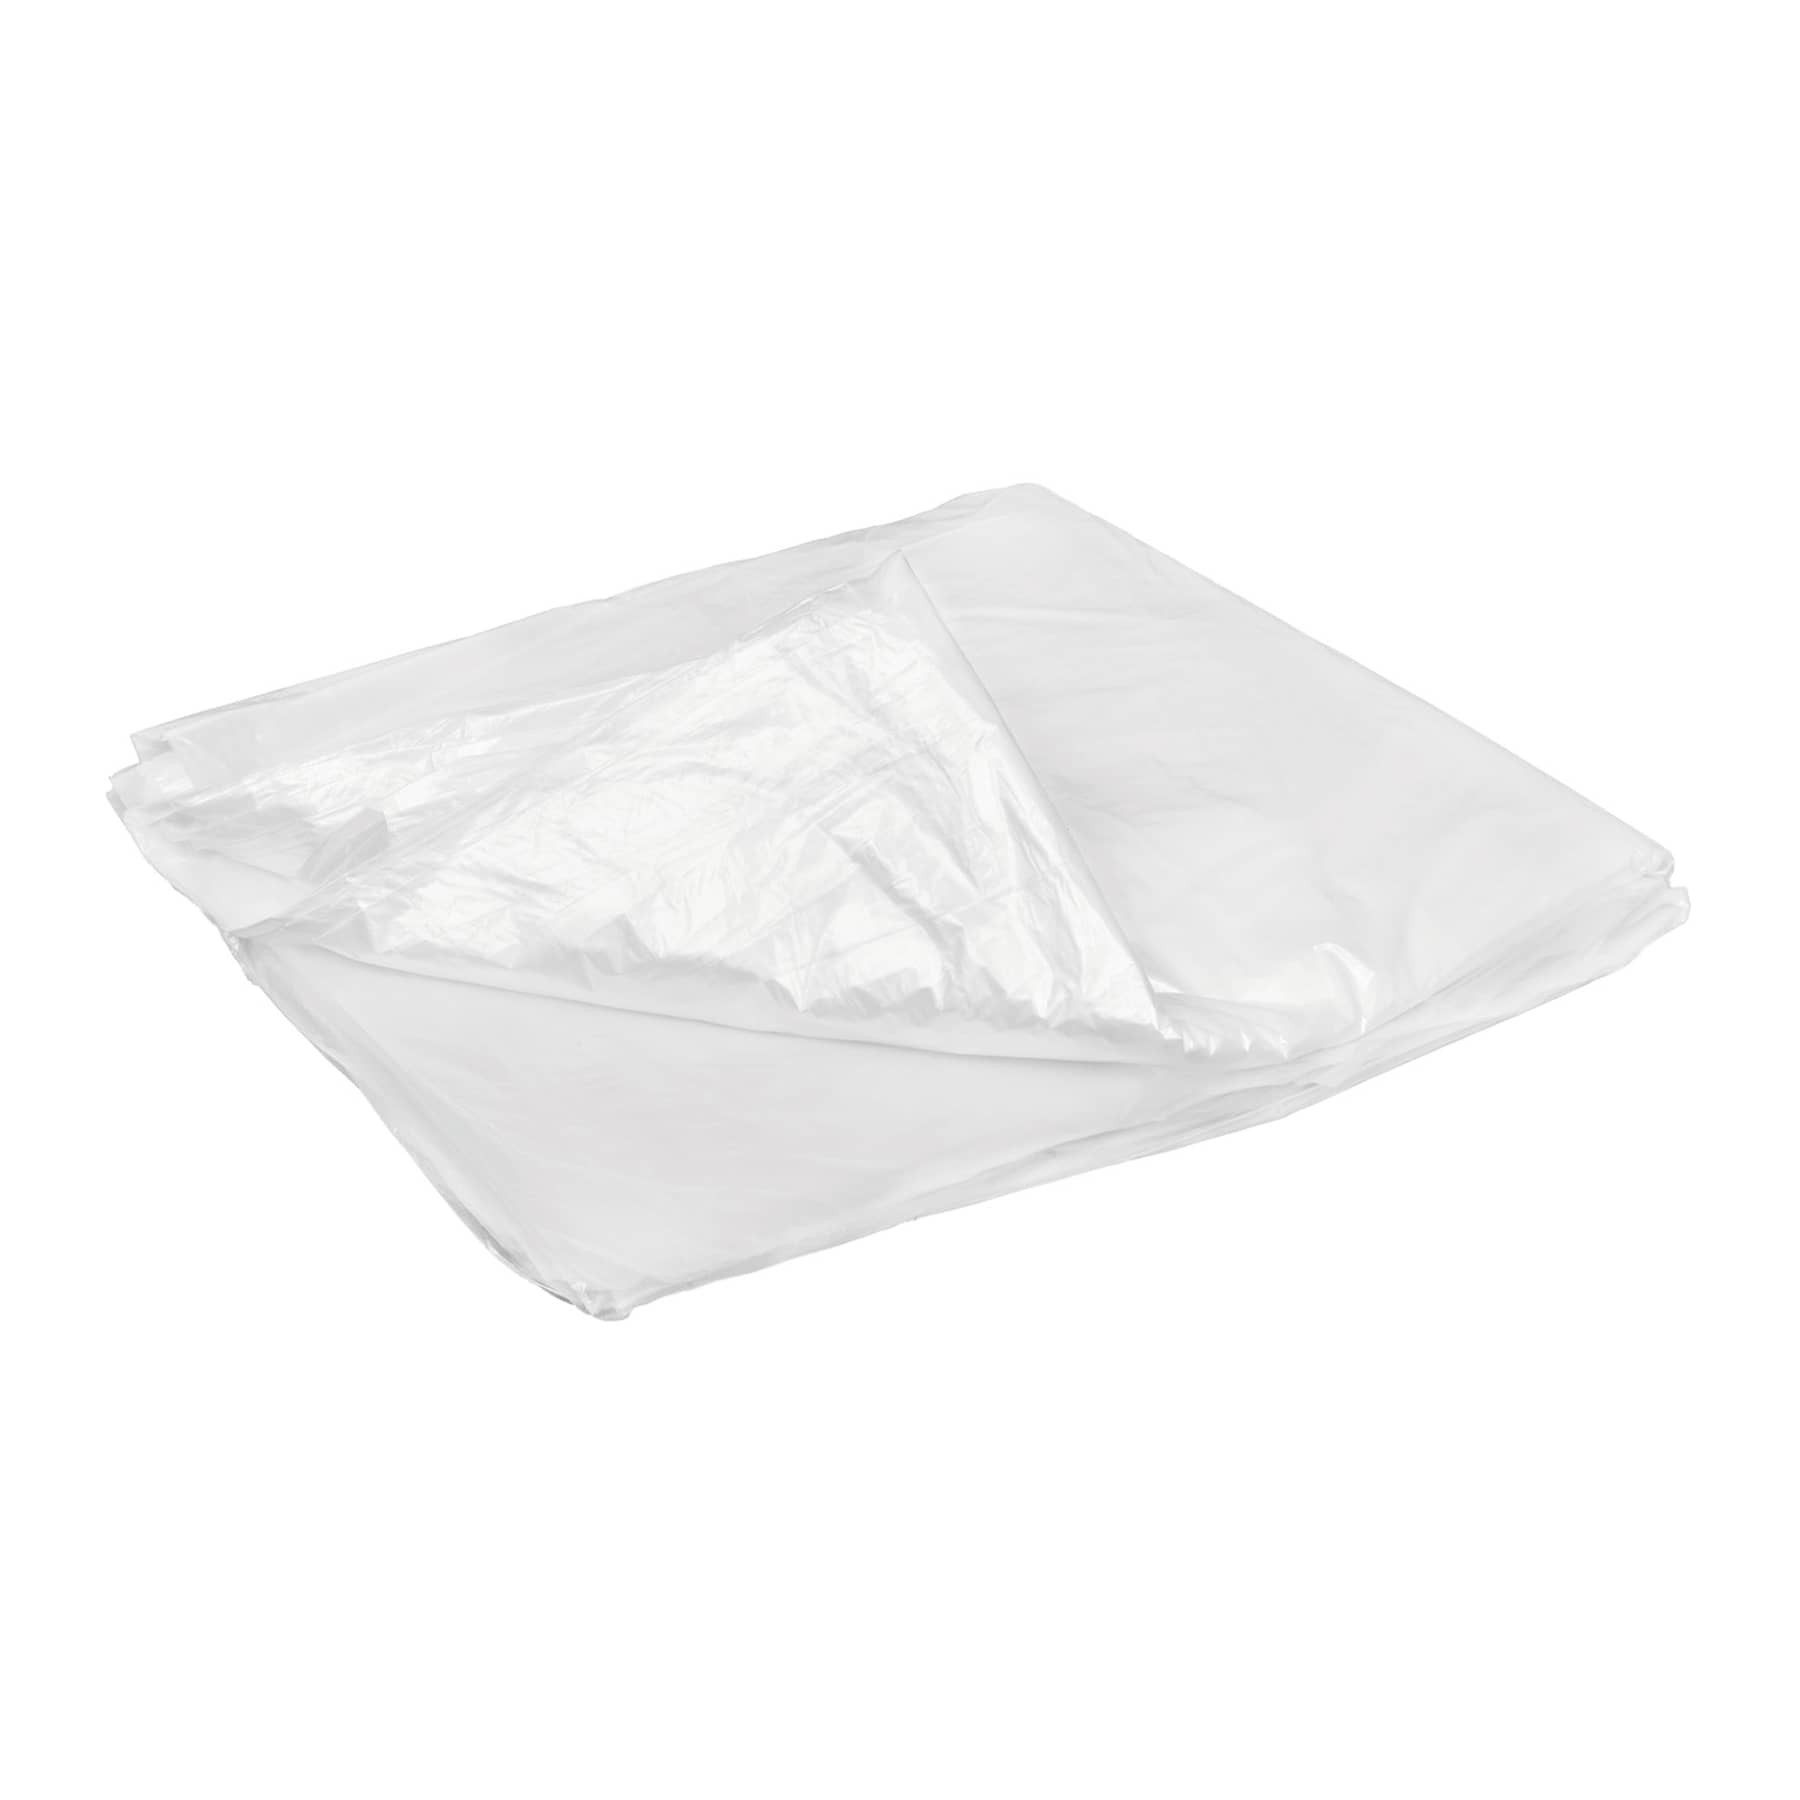 Plastiprotector 10 m2, uso rudo